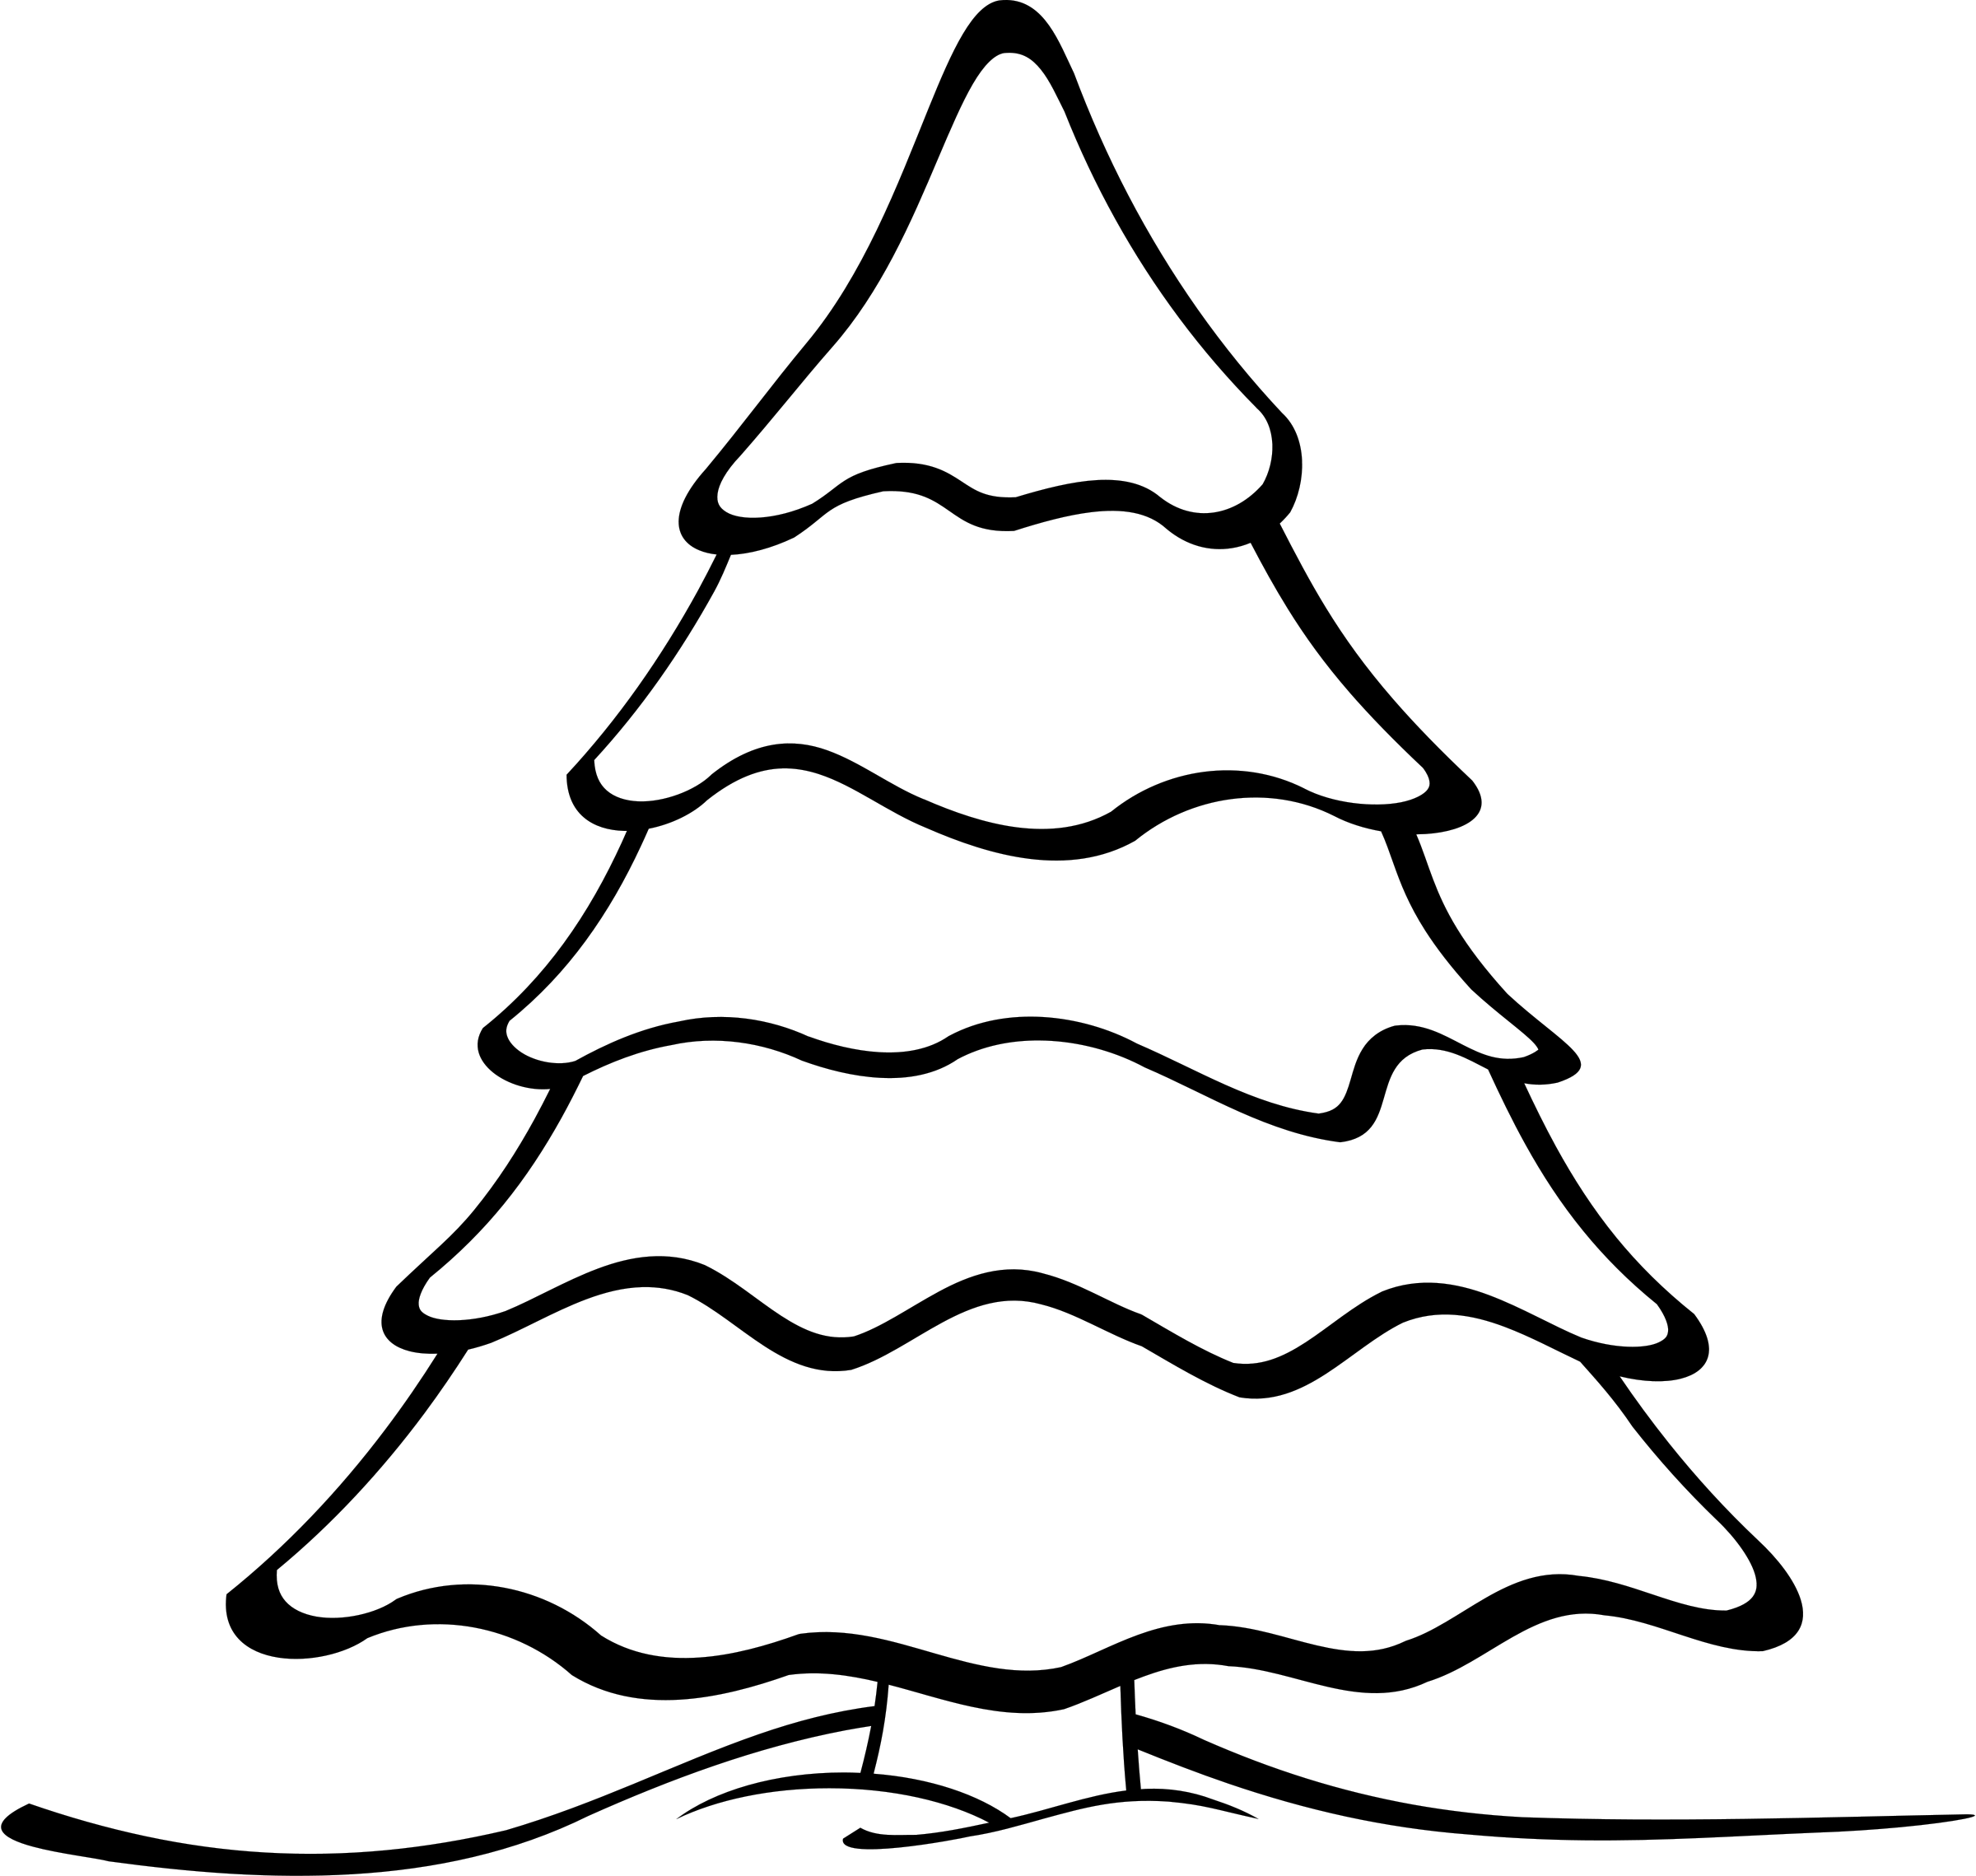 2400x2278 Christmas Tree Silhouette Clip Art